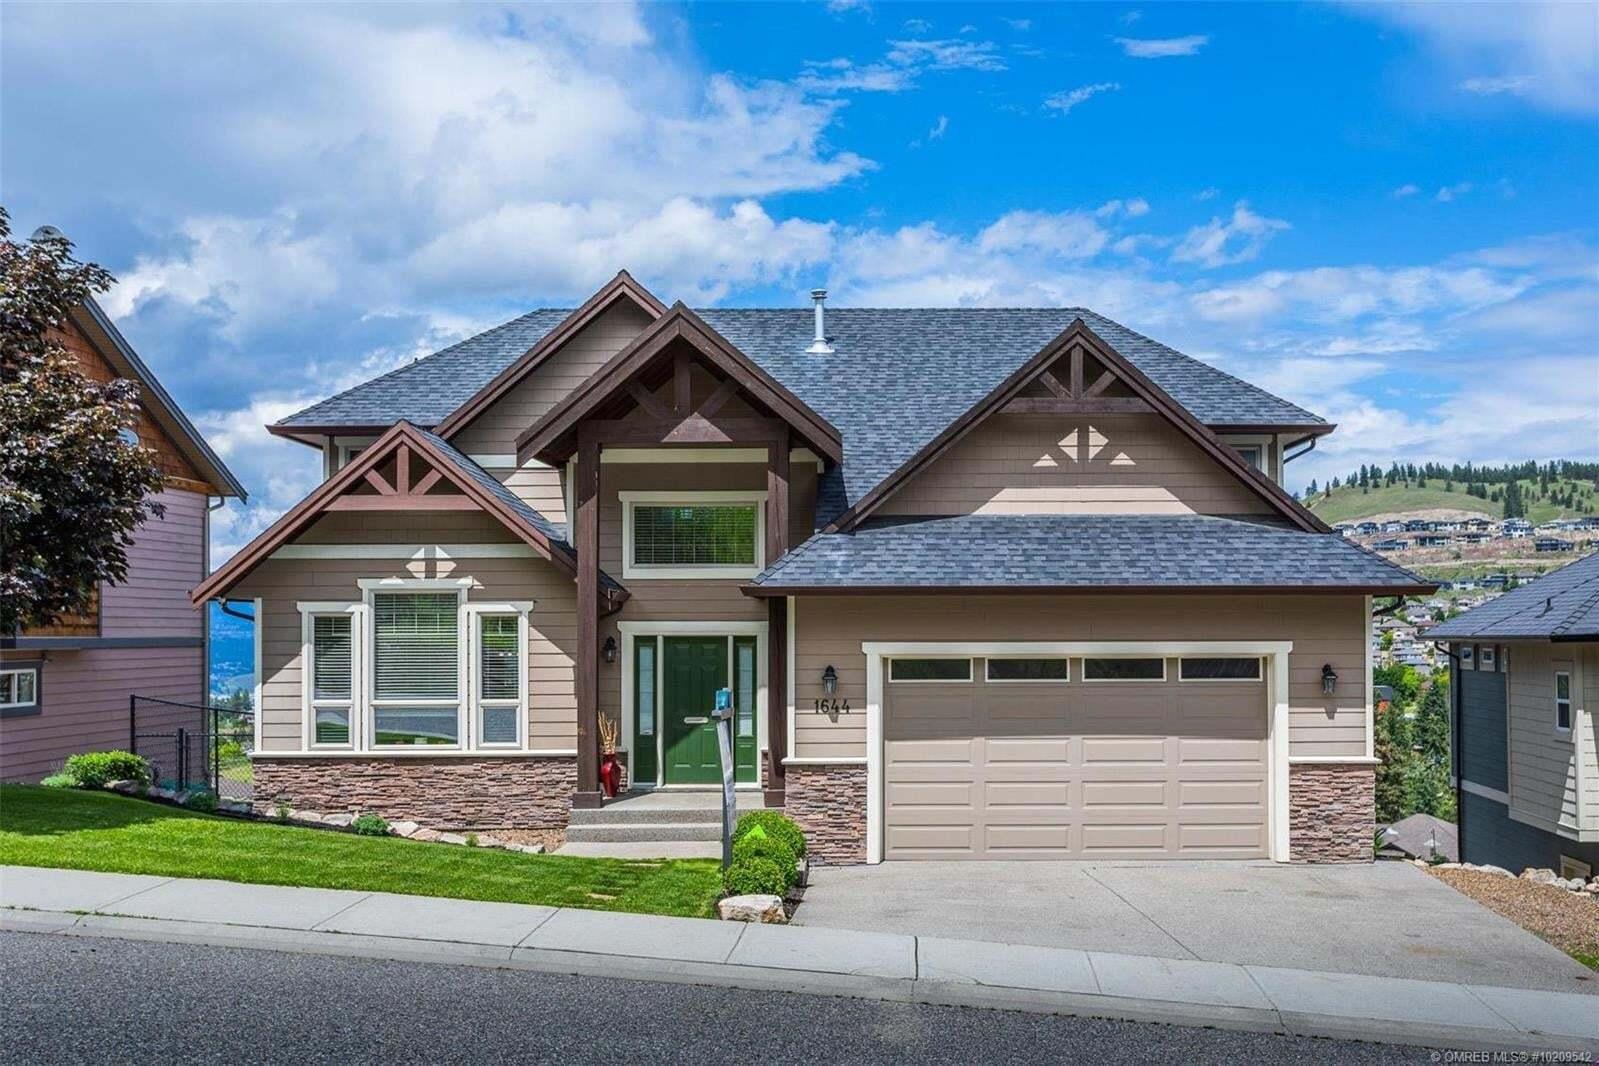 House for sale at 1644 Sunrise Rd Kelowna British Columbia - MLS: 10209542